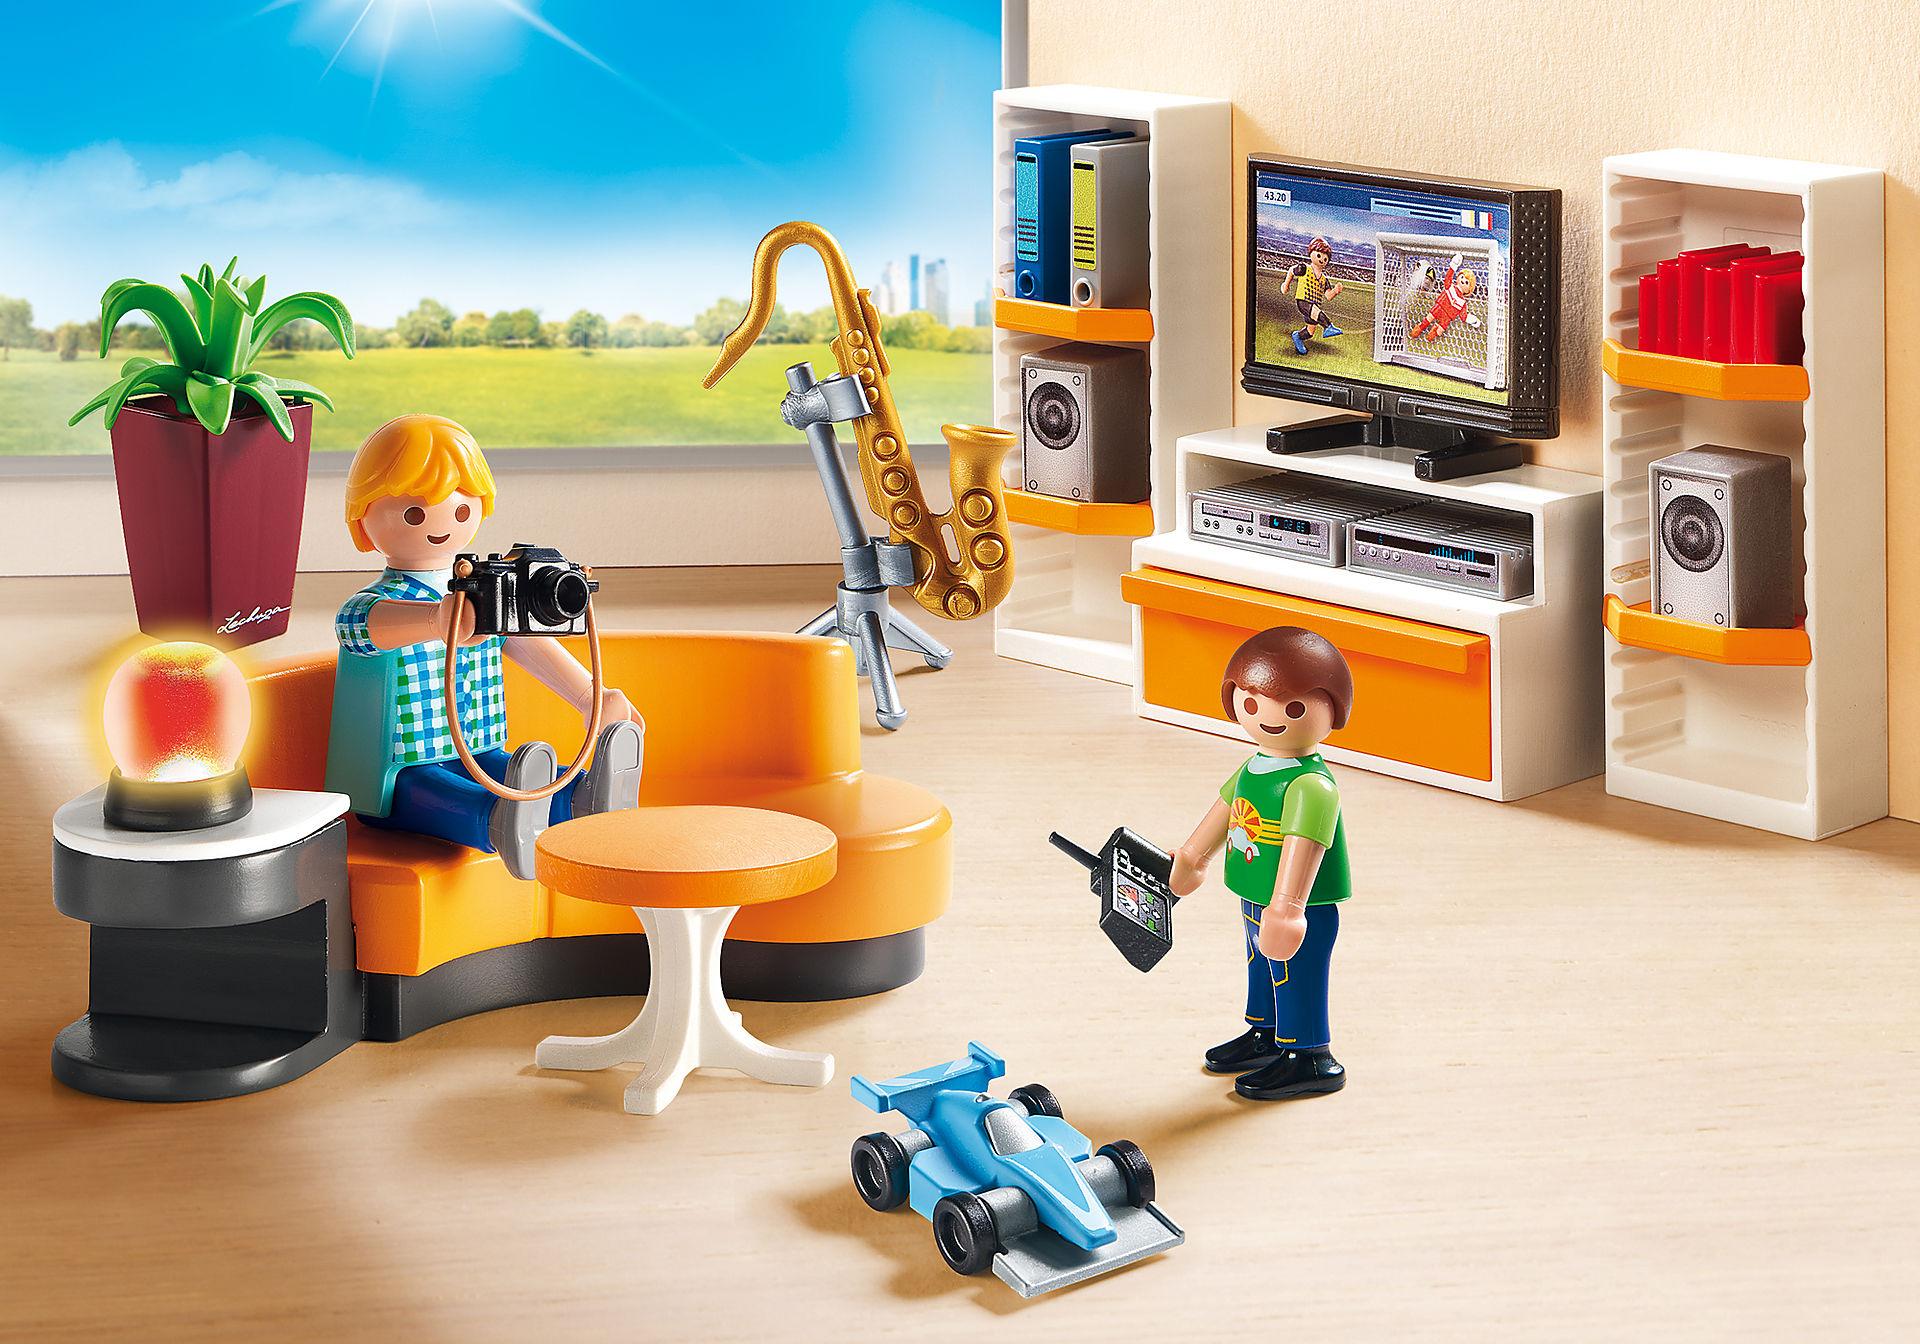 http://media.playmobil.com/i/playmobil/9267_product_detail/Salon équipé